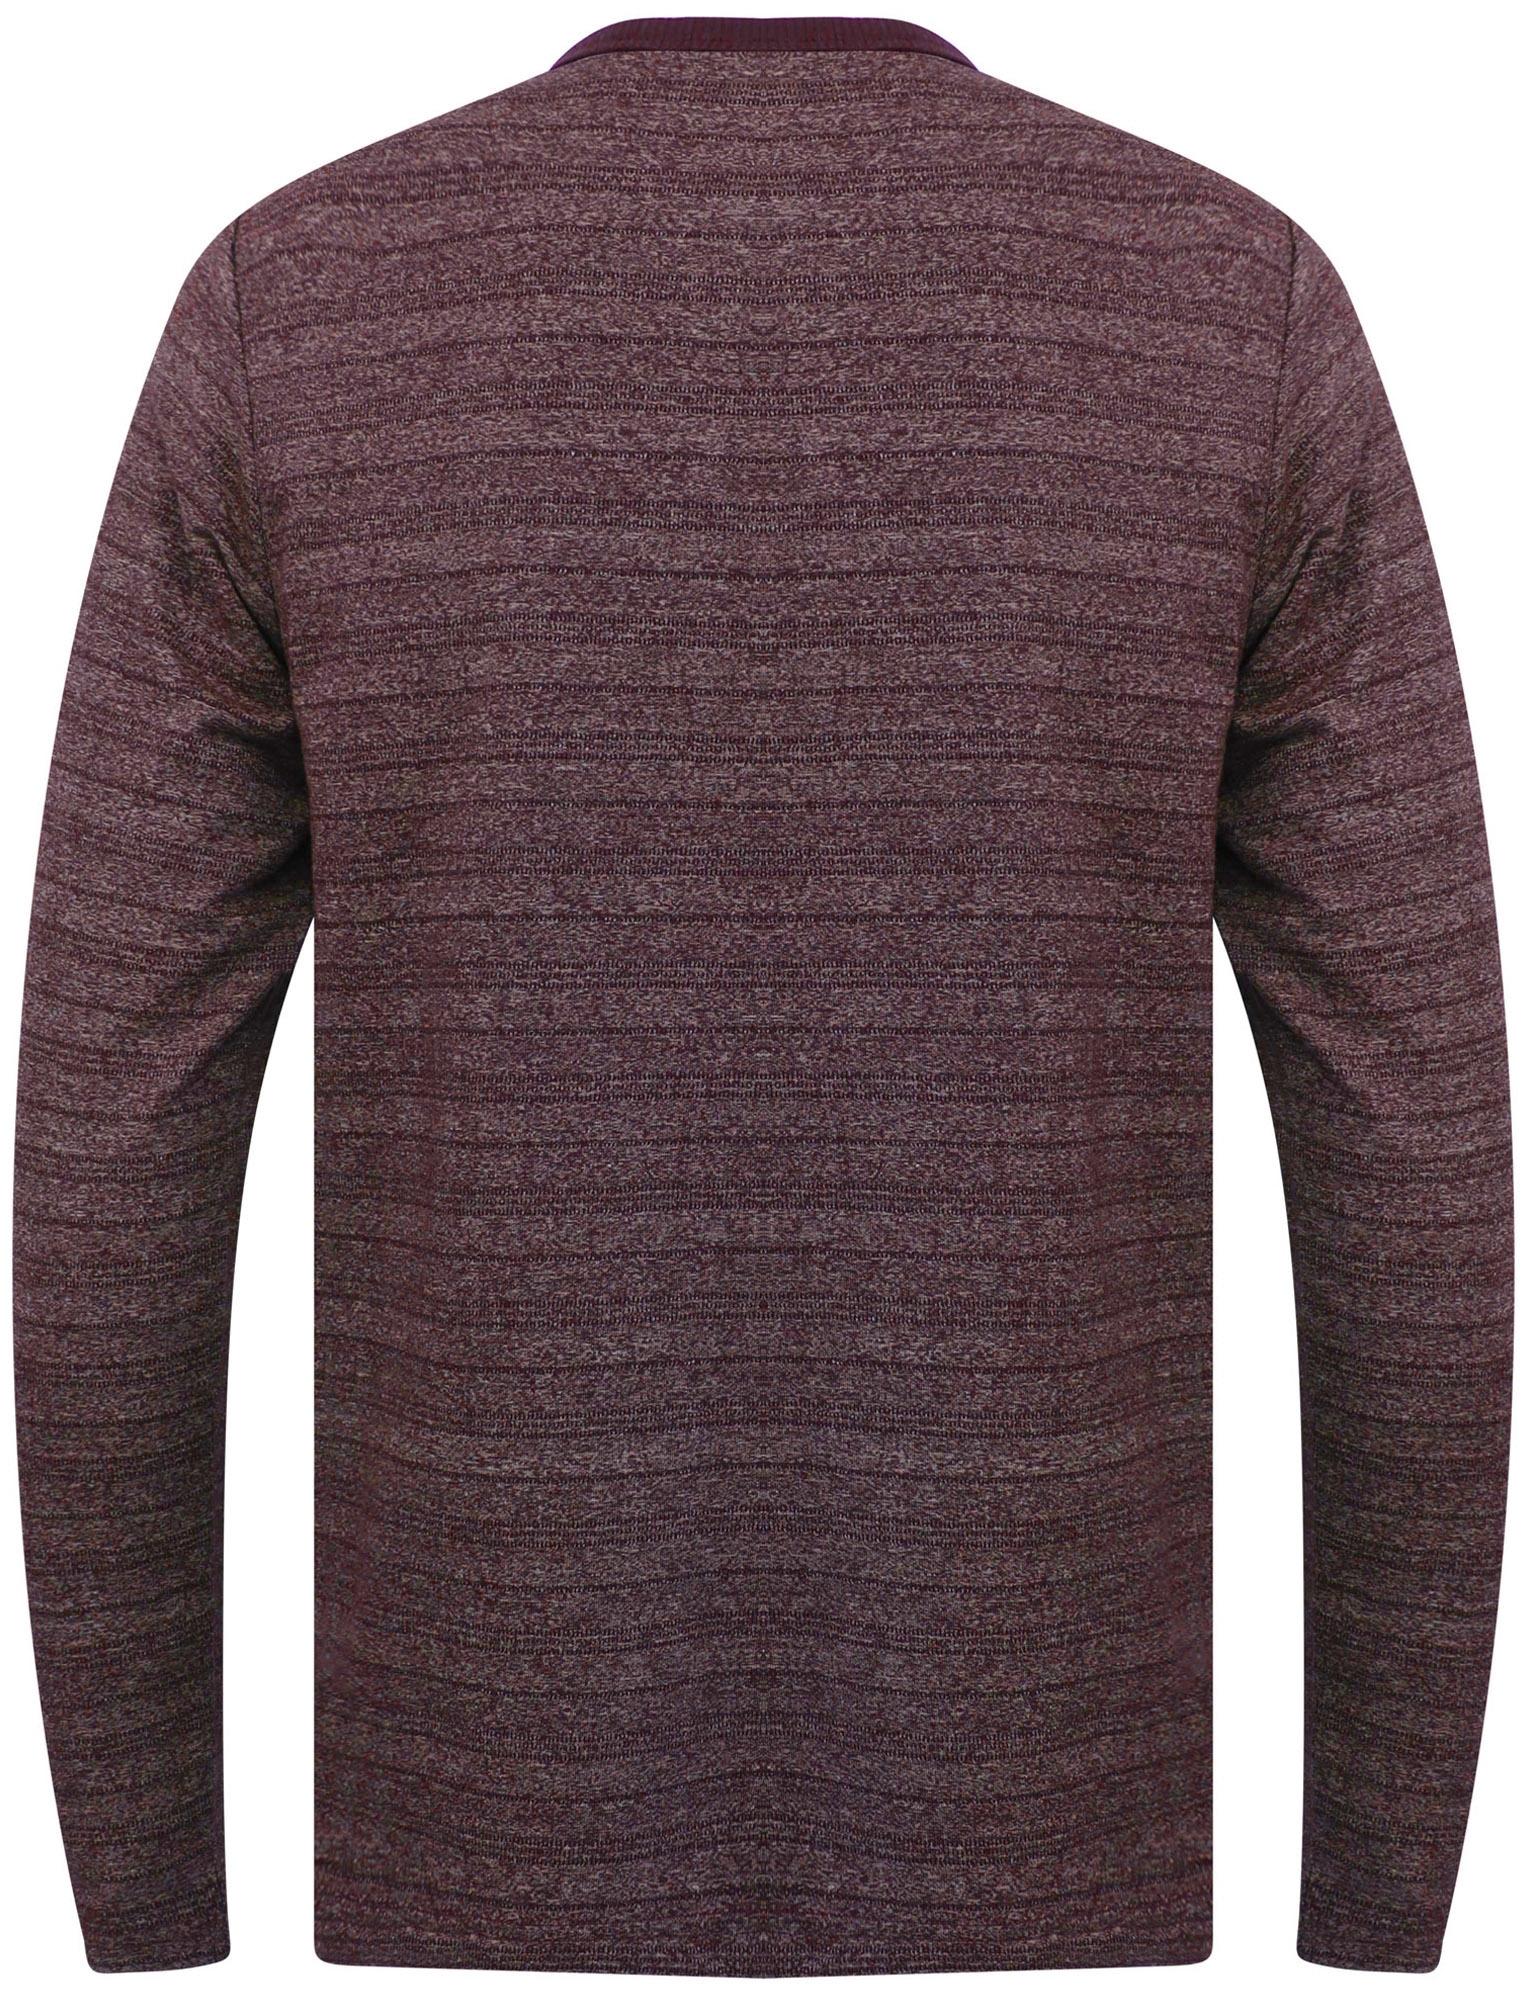 Tokyo-Laundry-Men-Hoaden-Crew-Neck-Long-Sleeve-T-Shirt-Top-Henley-Grandad-Collar thumbnail 8